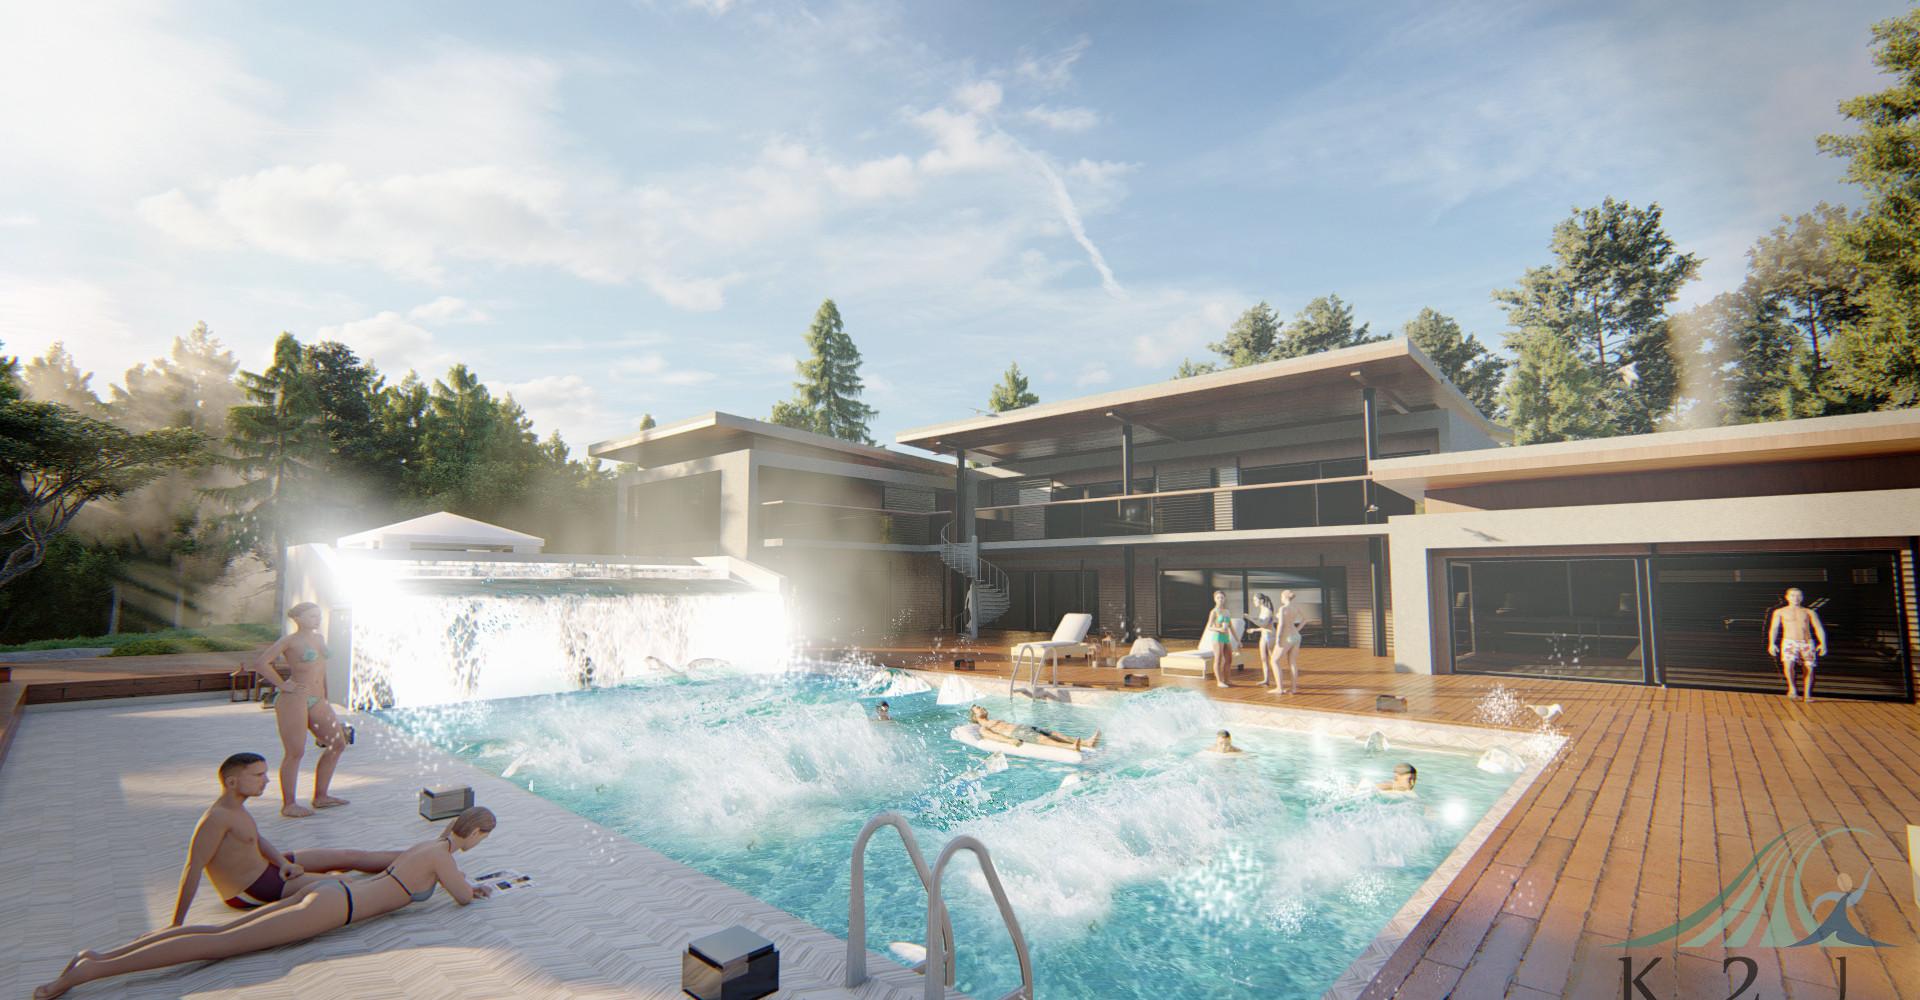 Wave pool ในบ้าน